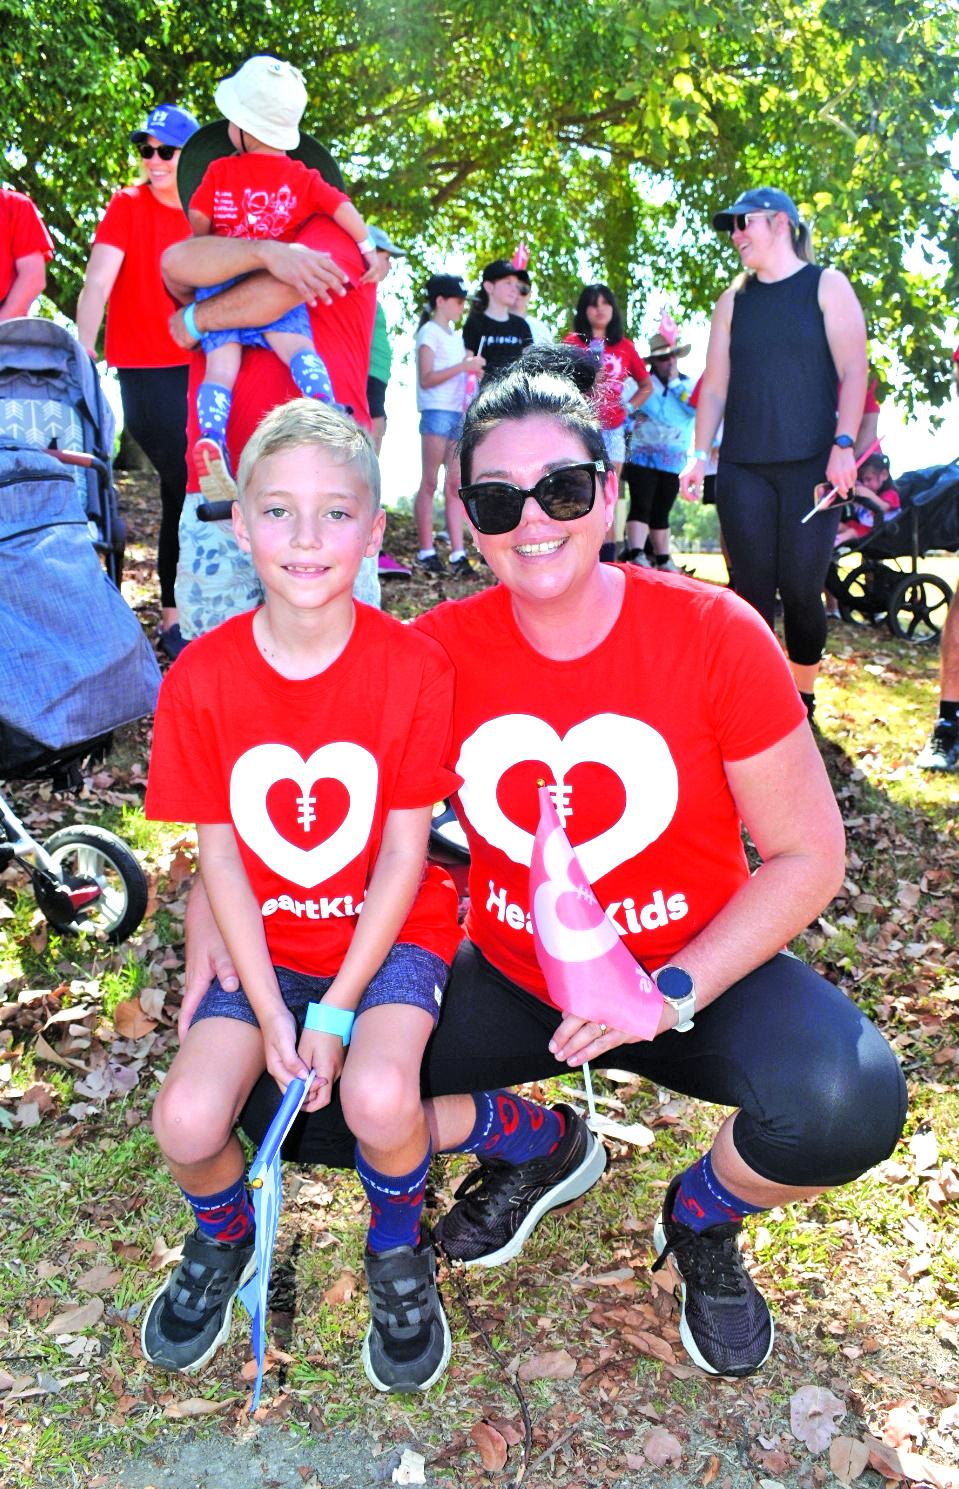 Charity Walk Gets Pulses Racing